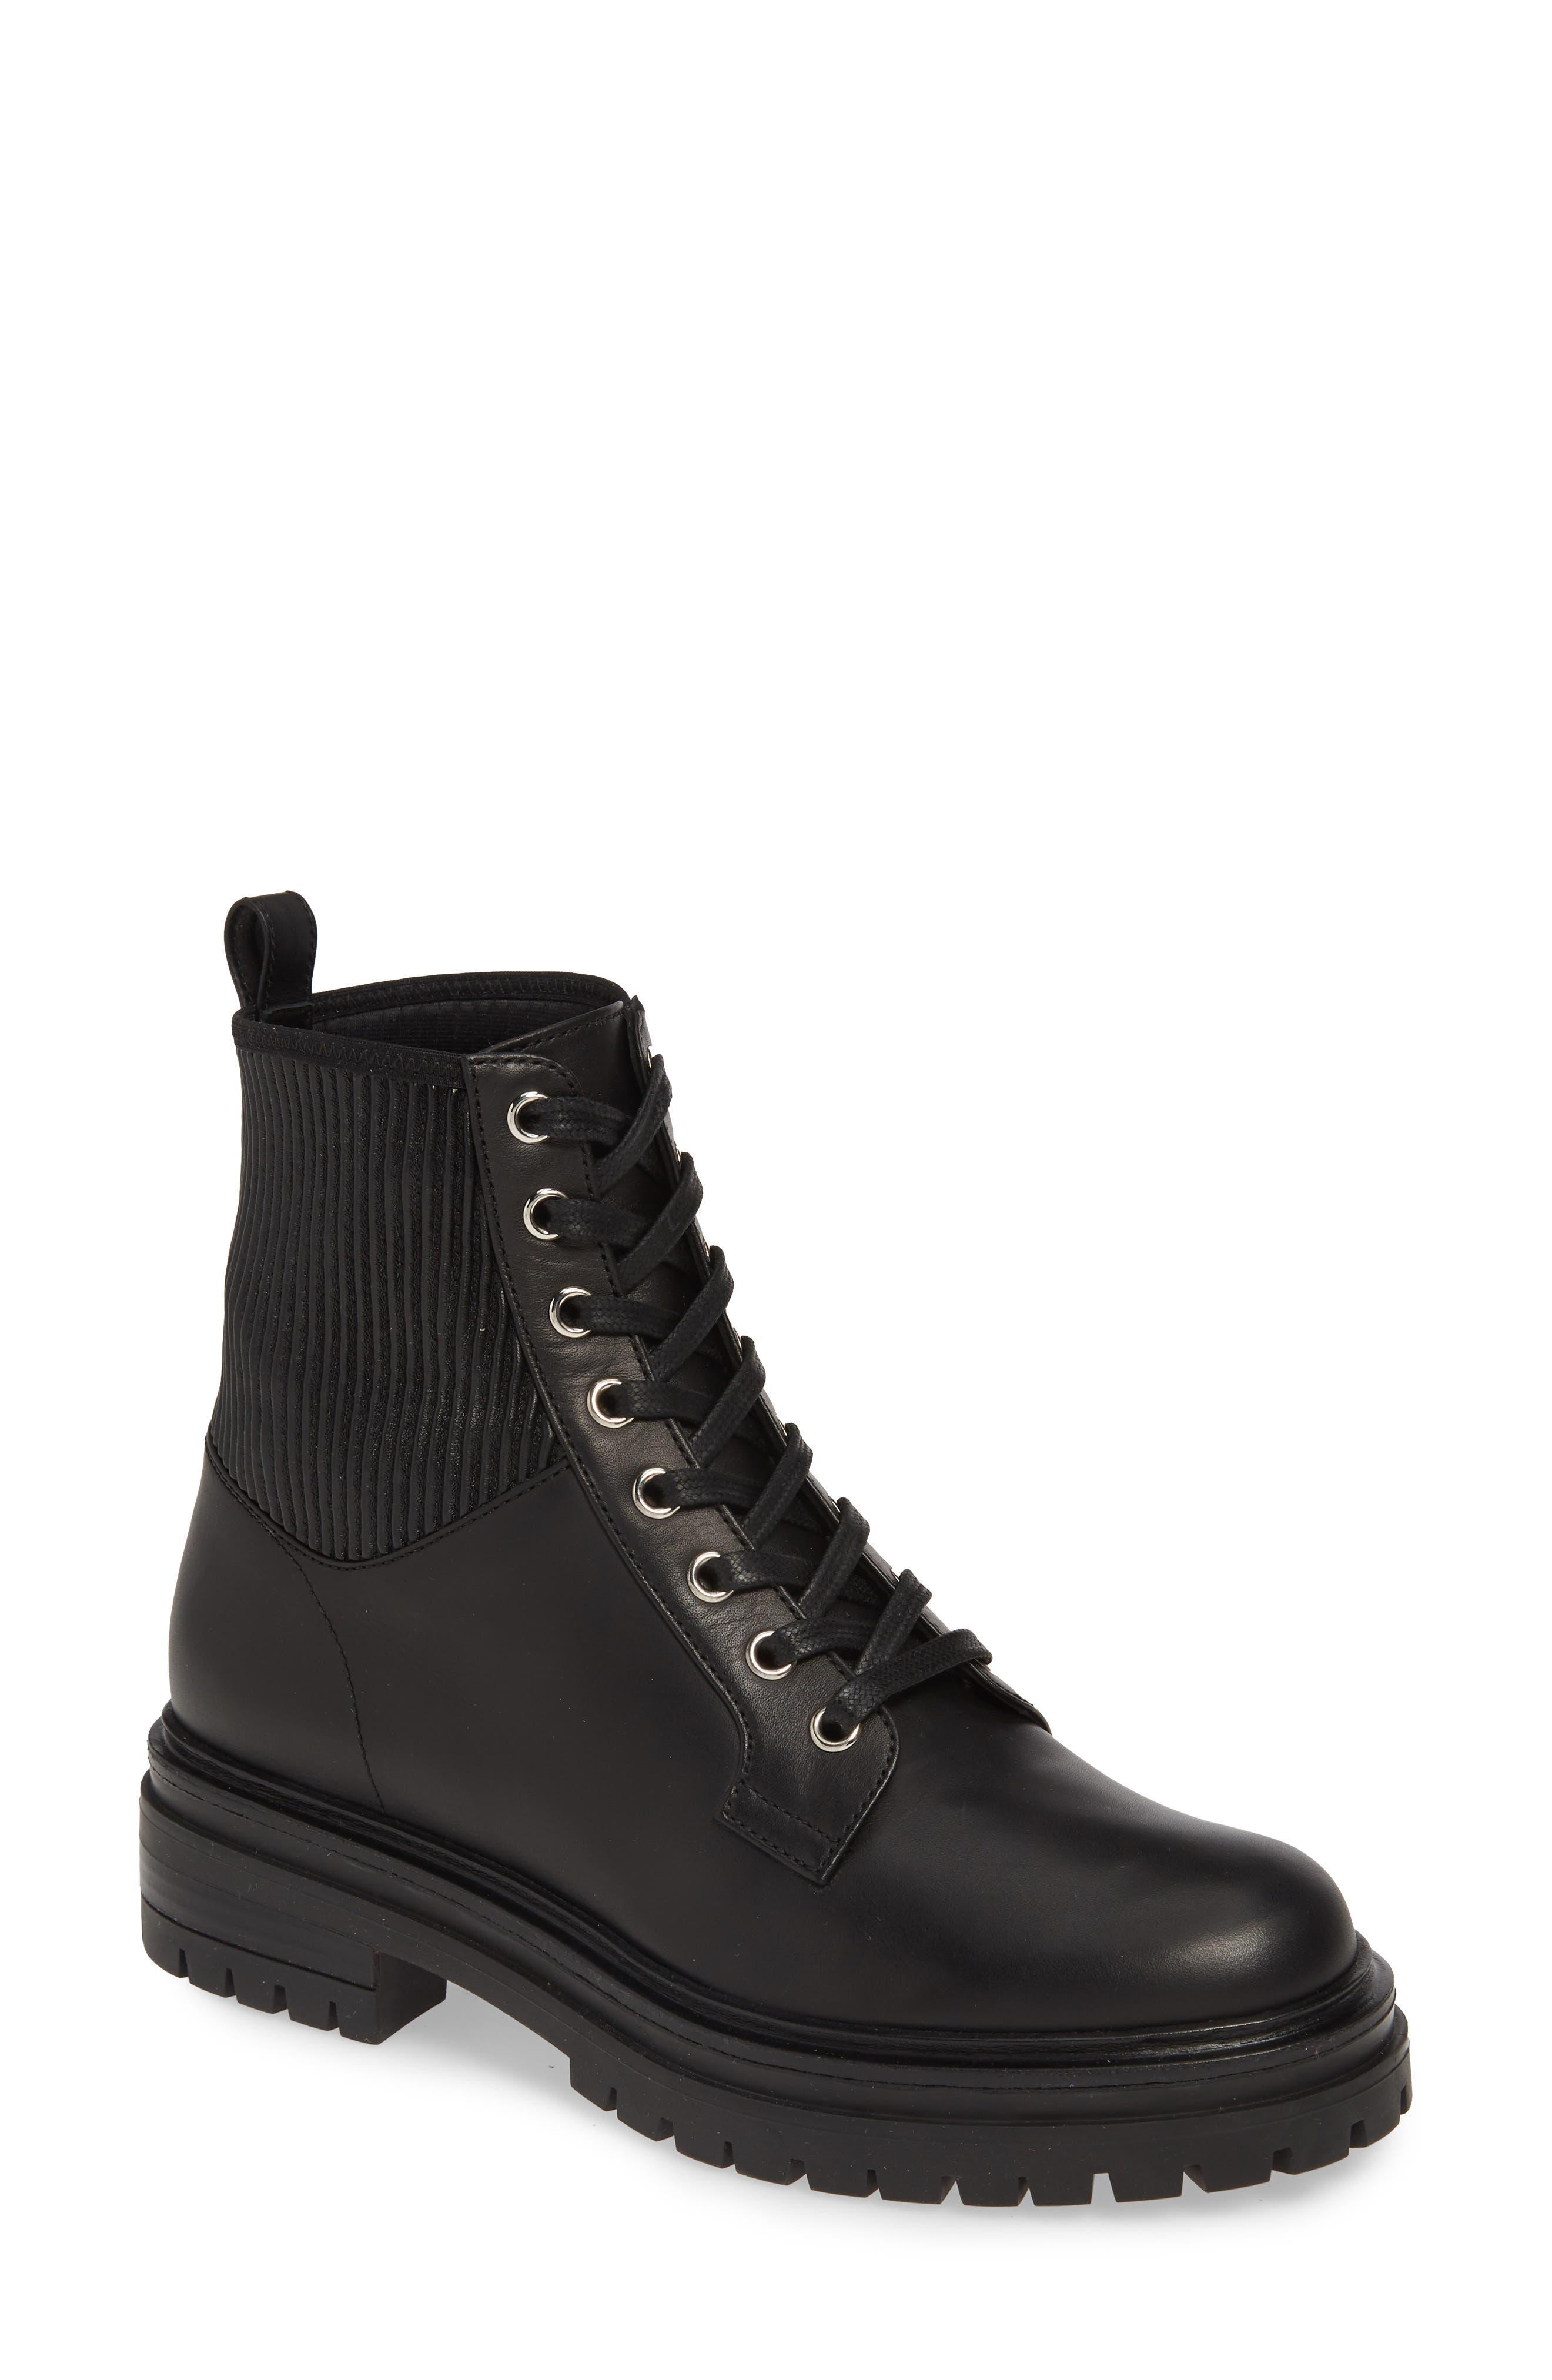 Women's Designer Shoes | Nordstrom